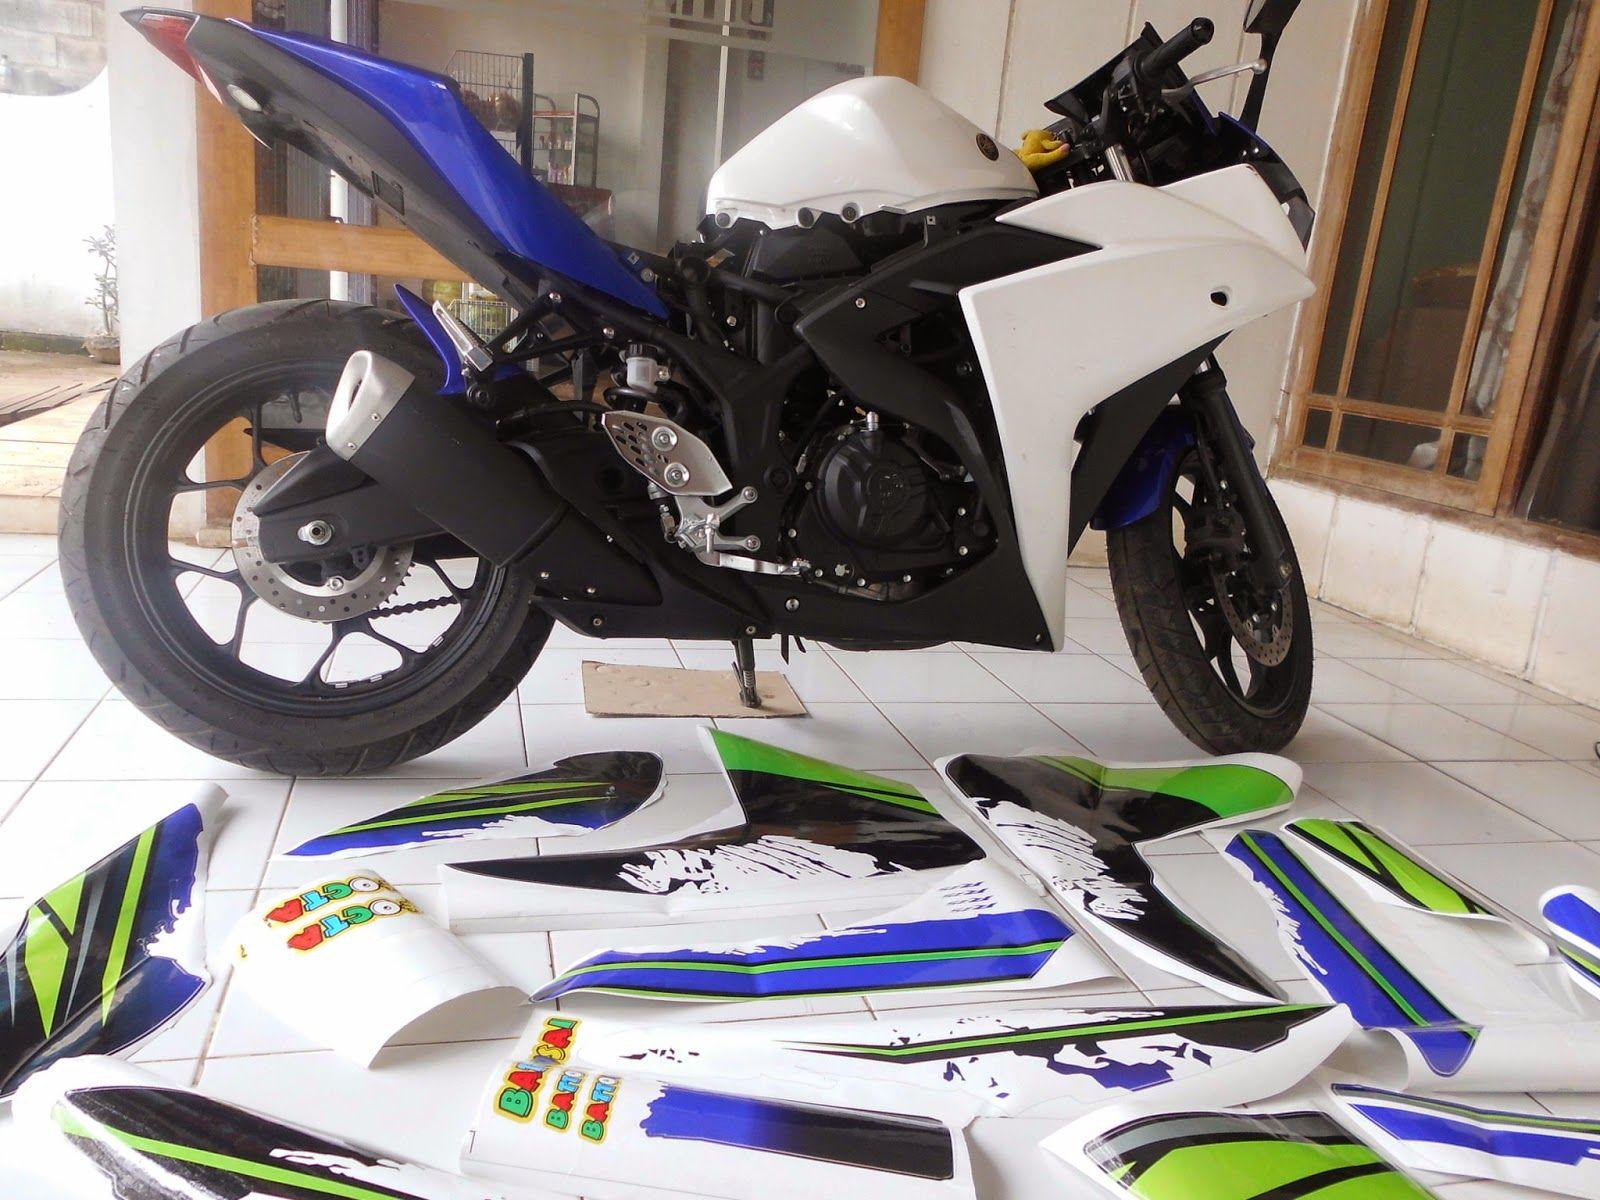 Modifikasi custom stripping motor yamaha r25 dengan motif motogp by digitive barometer sticker digital